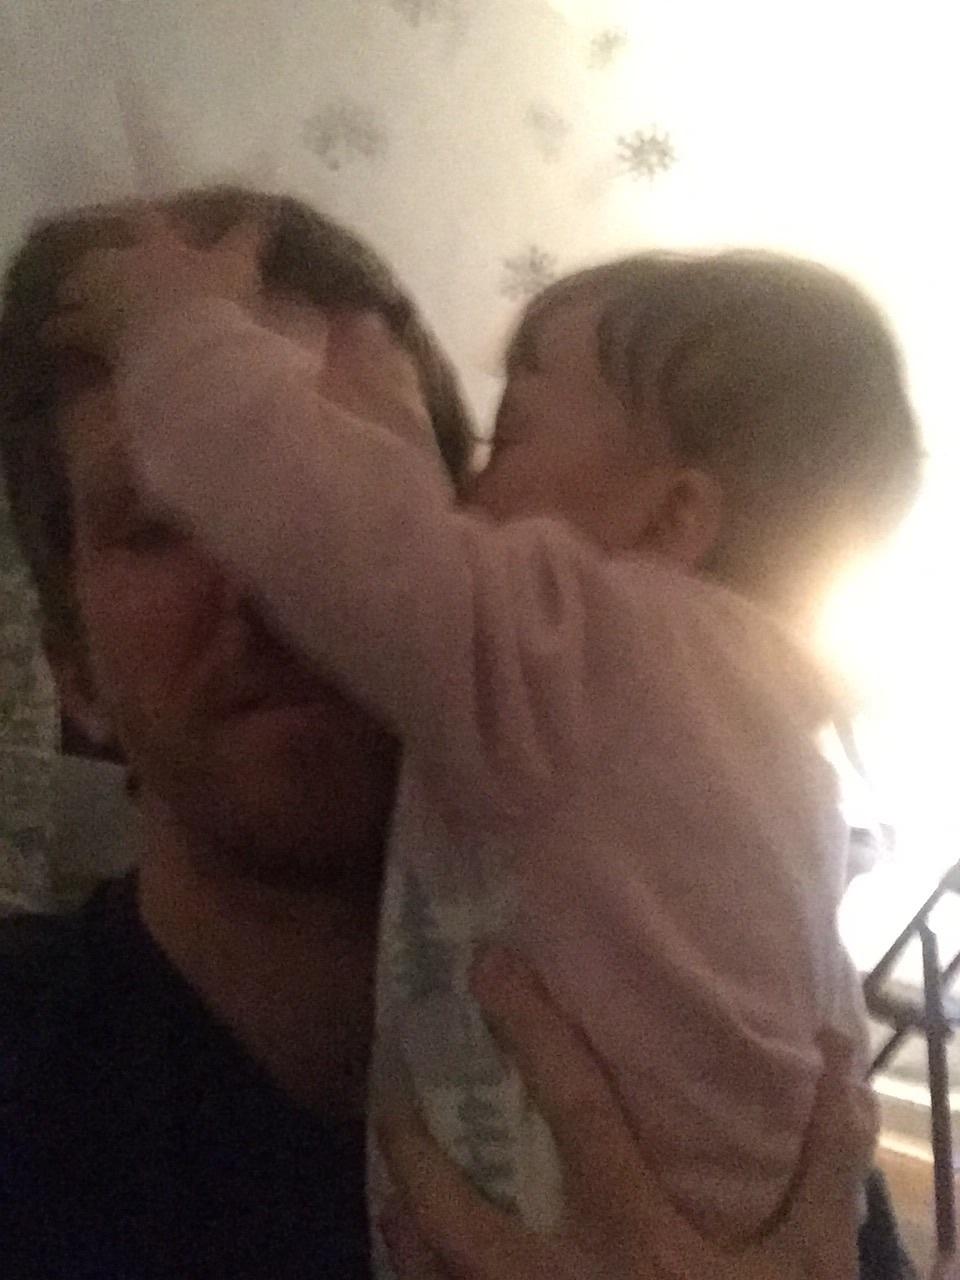 Oh the kissess lol. Sooooo slobbery.